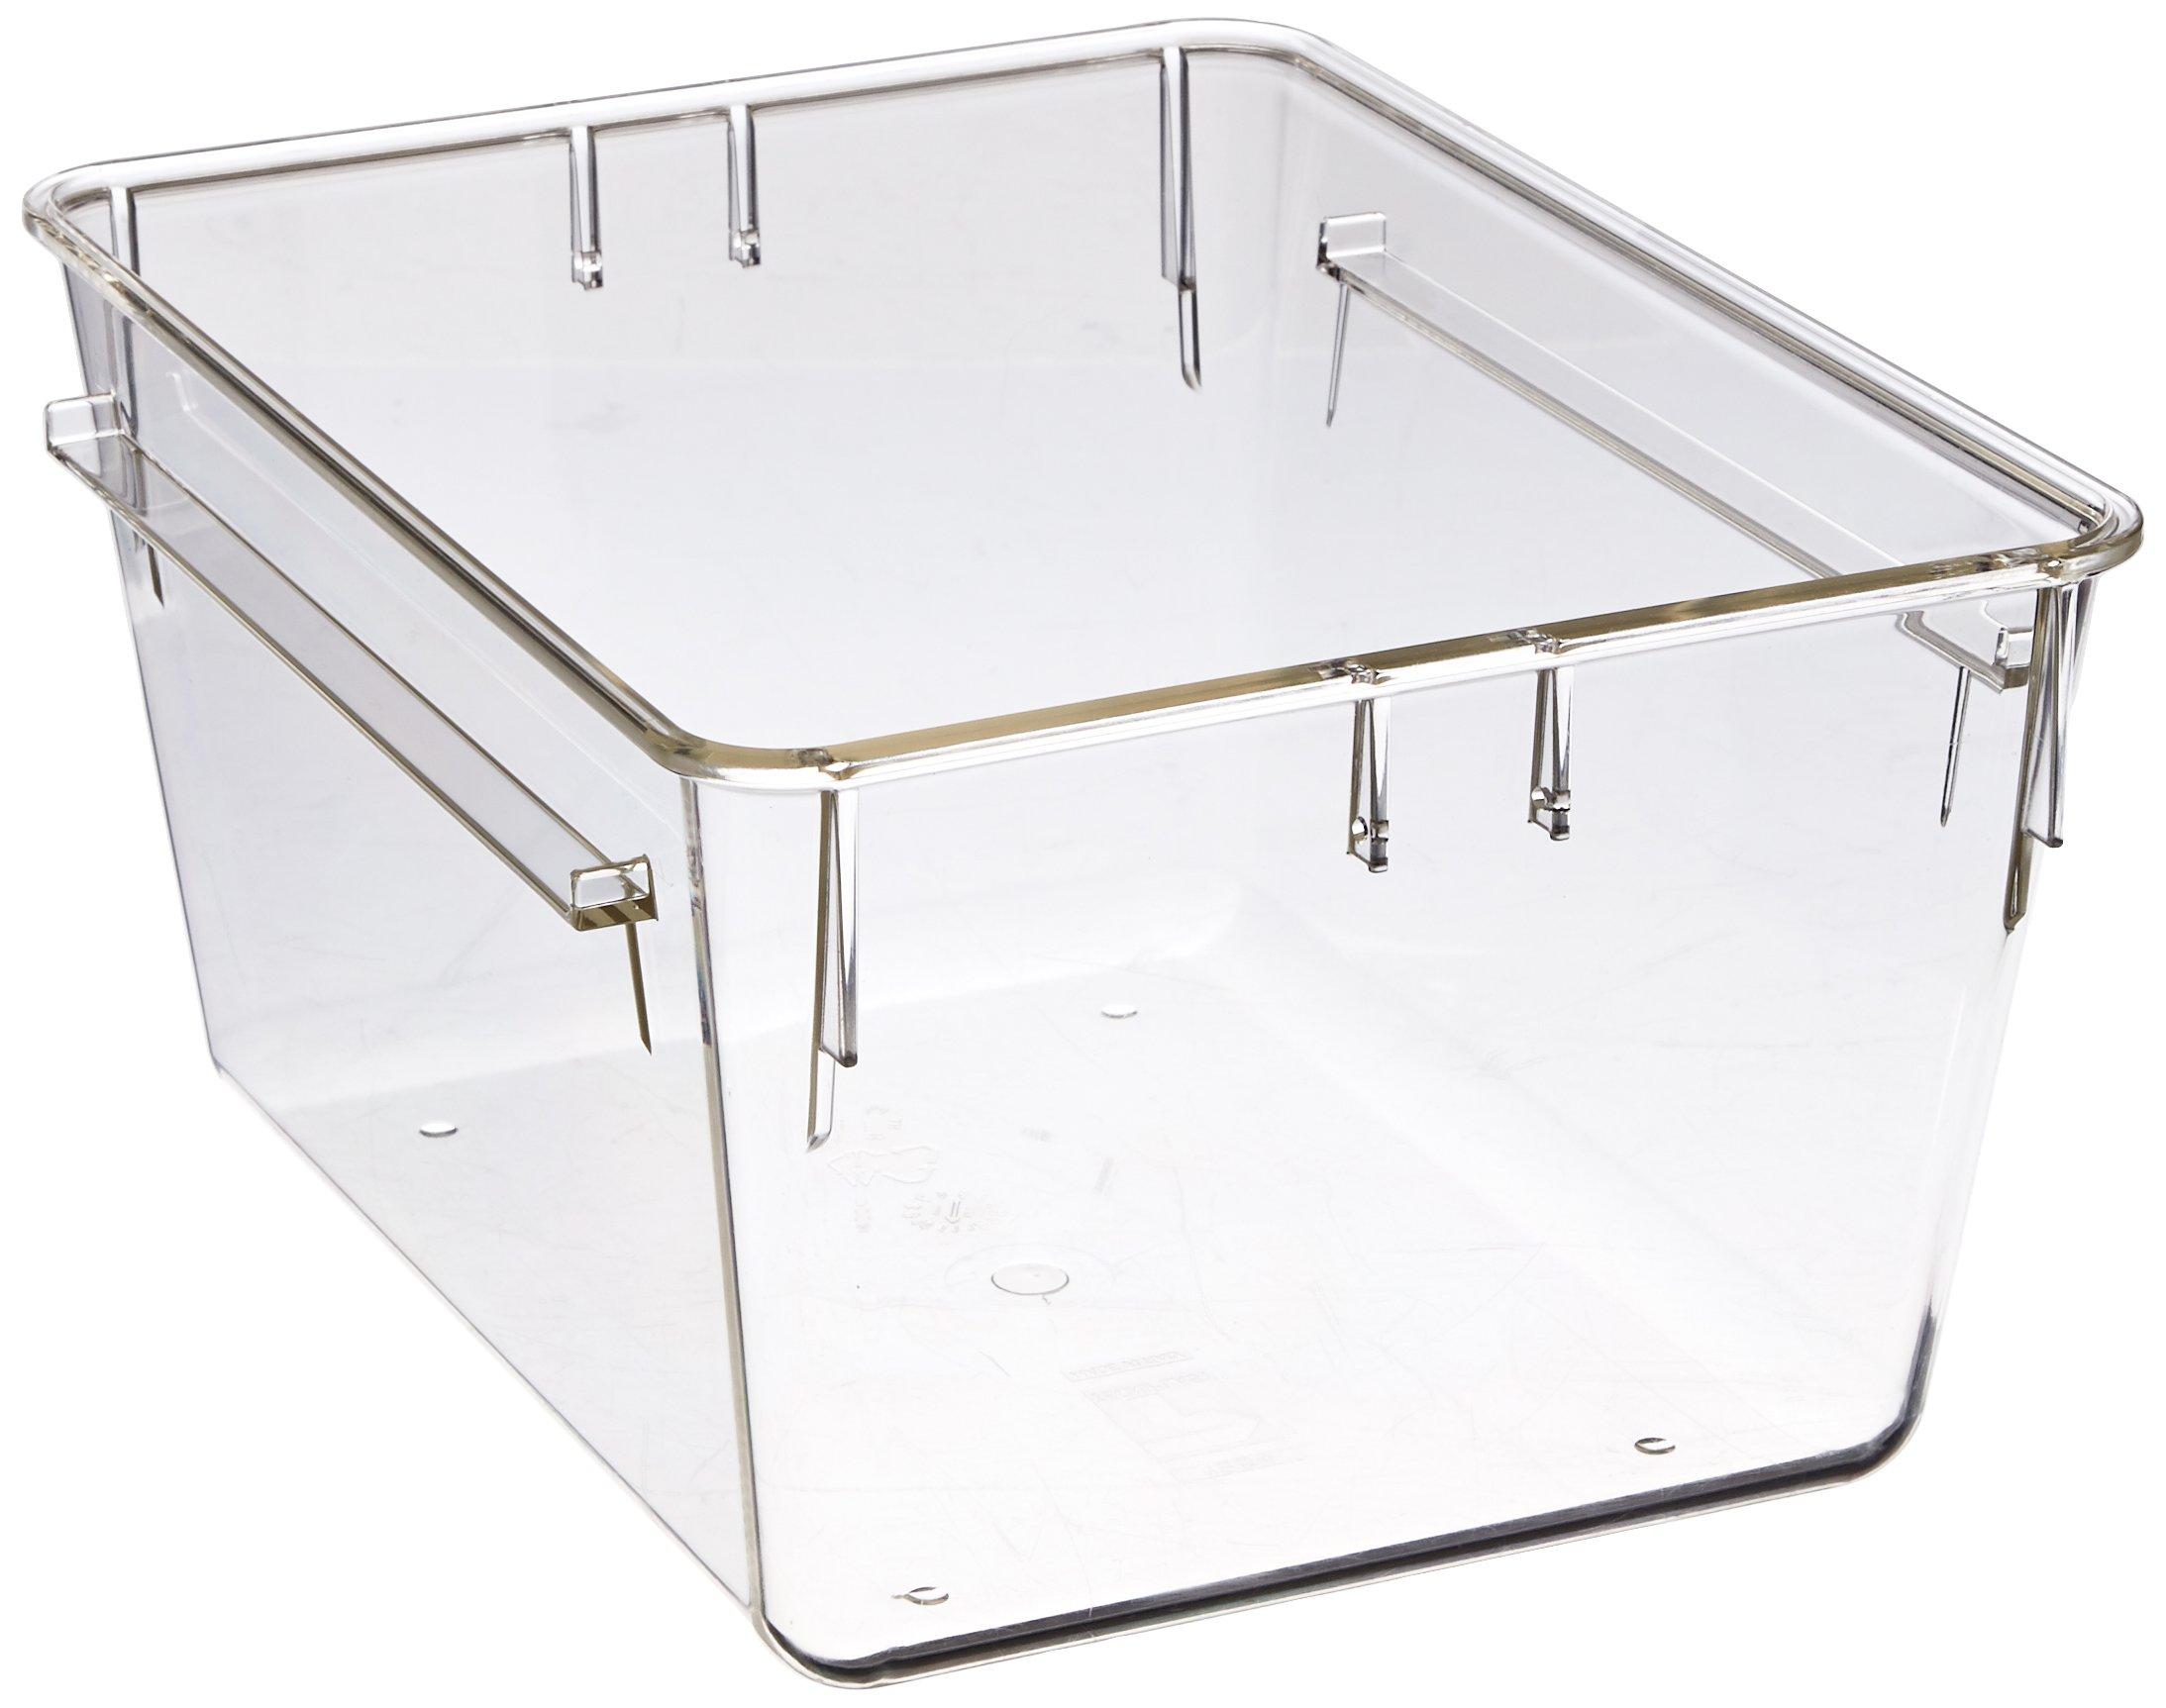 Tecniplast 1264C001 Polycarbonate Reusable Animal Cage System, Size C, 27 cm Length, 21 cm Width, 14 cm Height